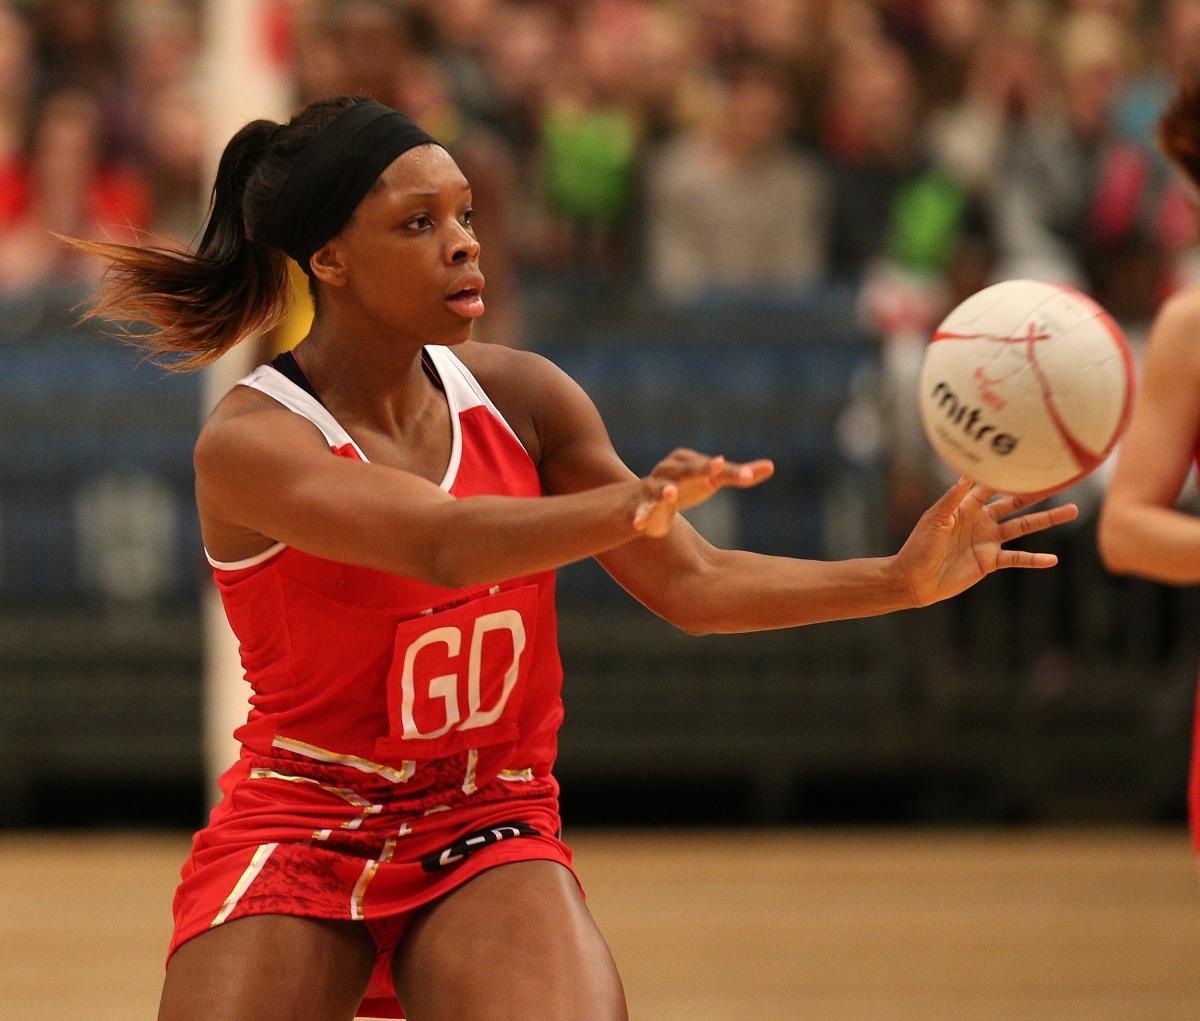 Glasgow 2014 Commonwealth Games England Netball Team Beat